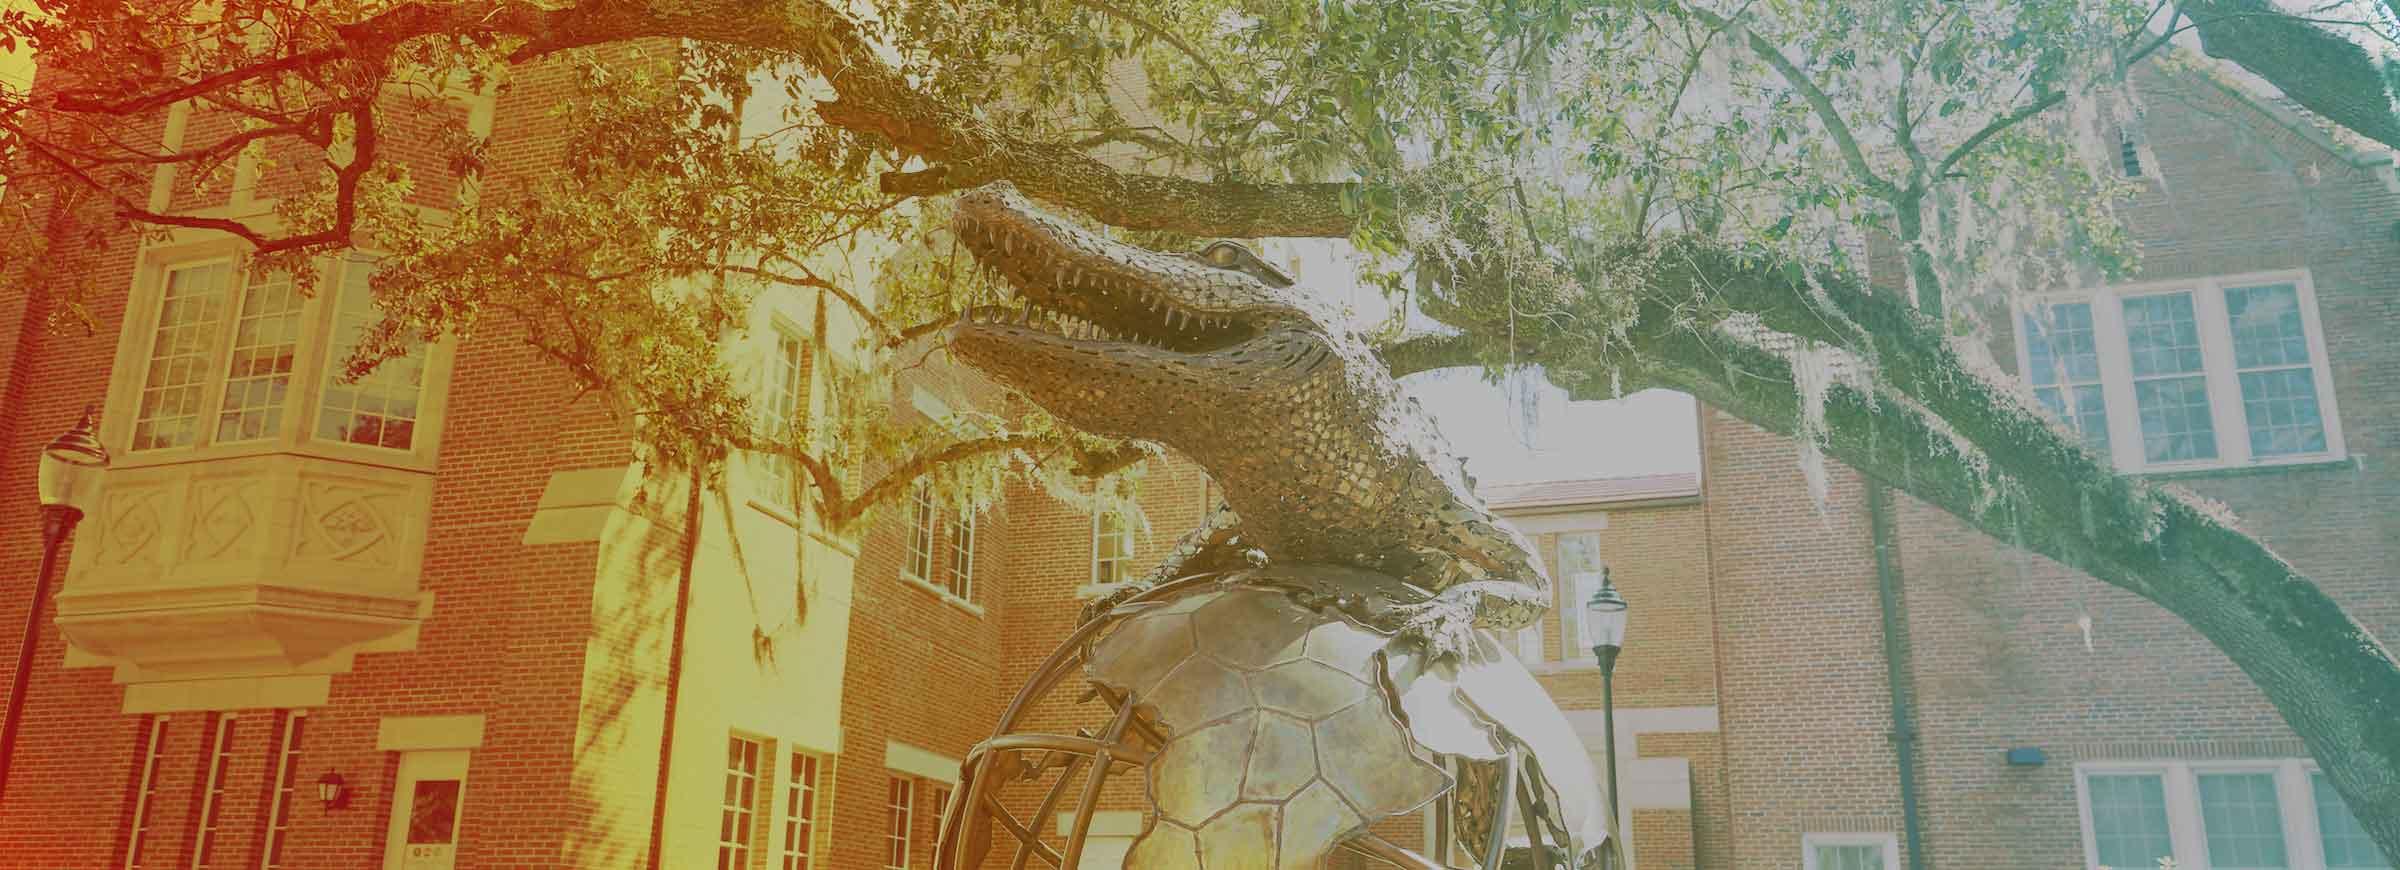 Uf Application Deadline >> Apply University Of Florida Online